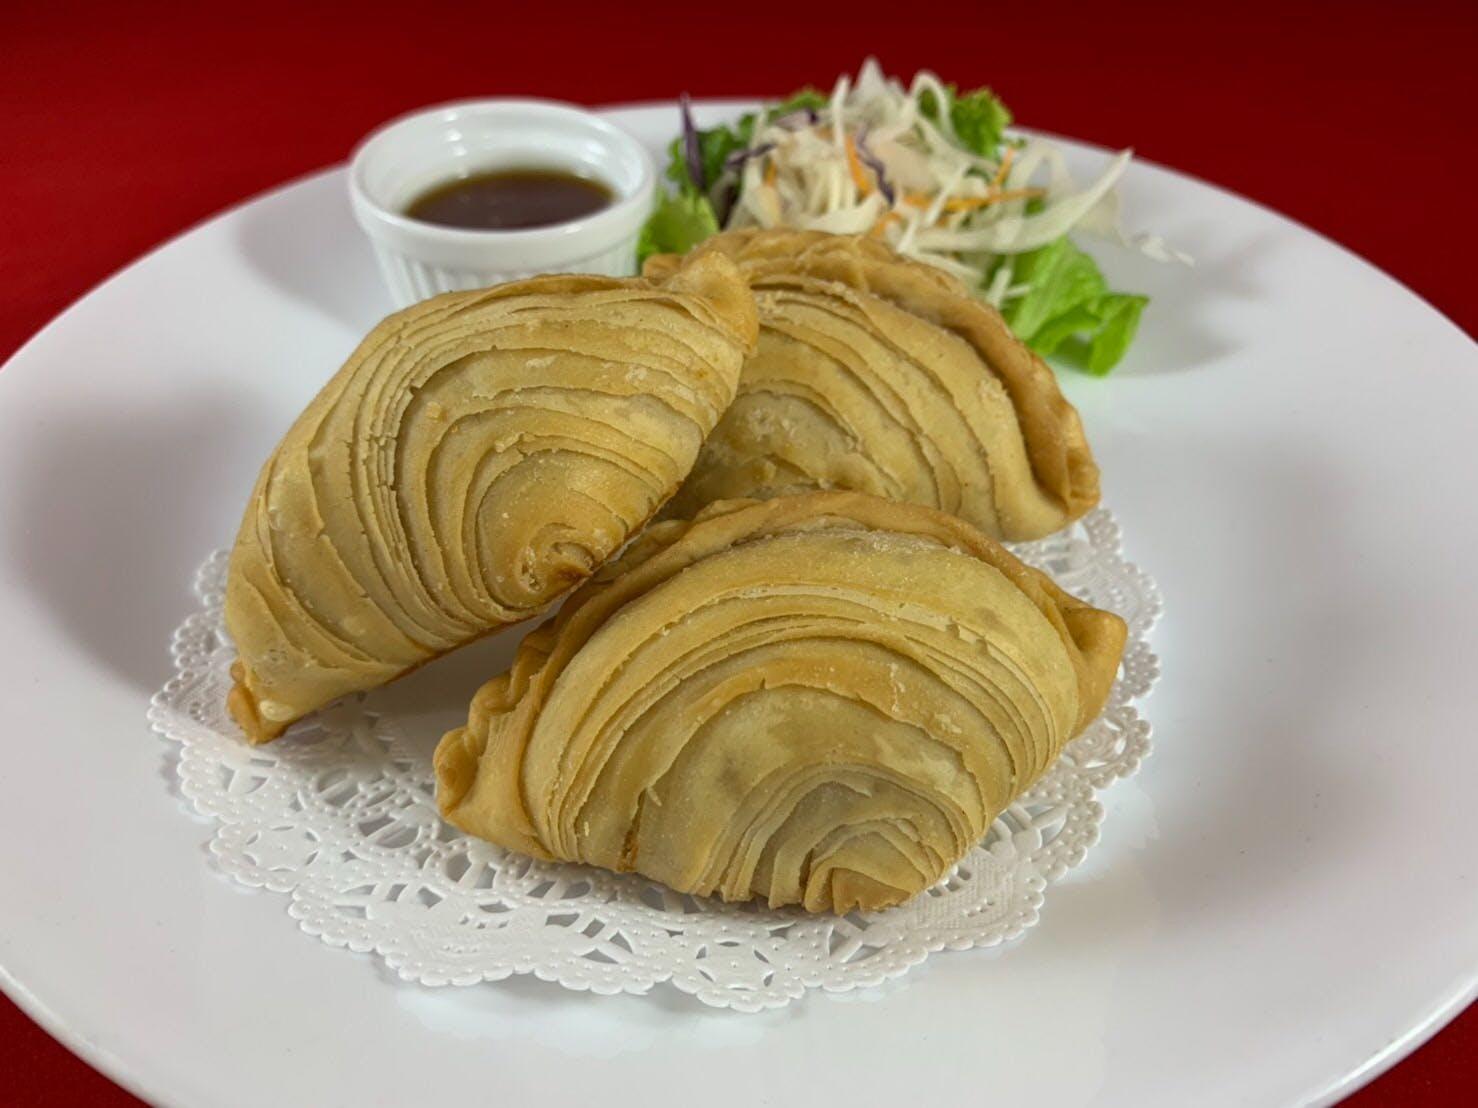 4. Ka Ree Puff (Dinner) from Sa-Bai Thong - University Ave in Madison, WI